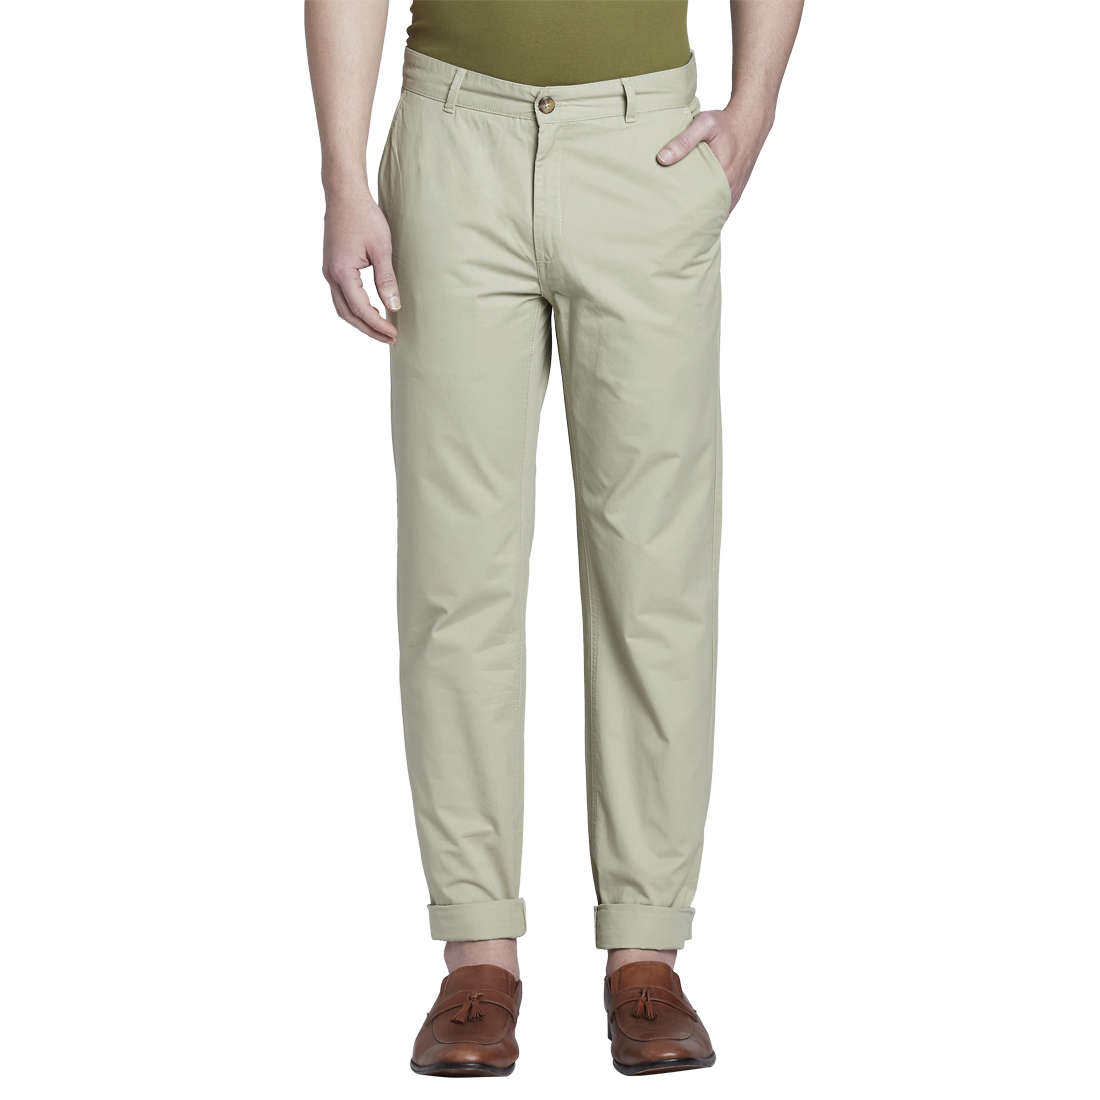 ColorPlus | ColorPlus Medium Fawn Tailored Fit Trouser